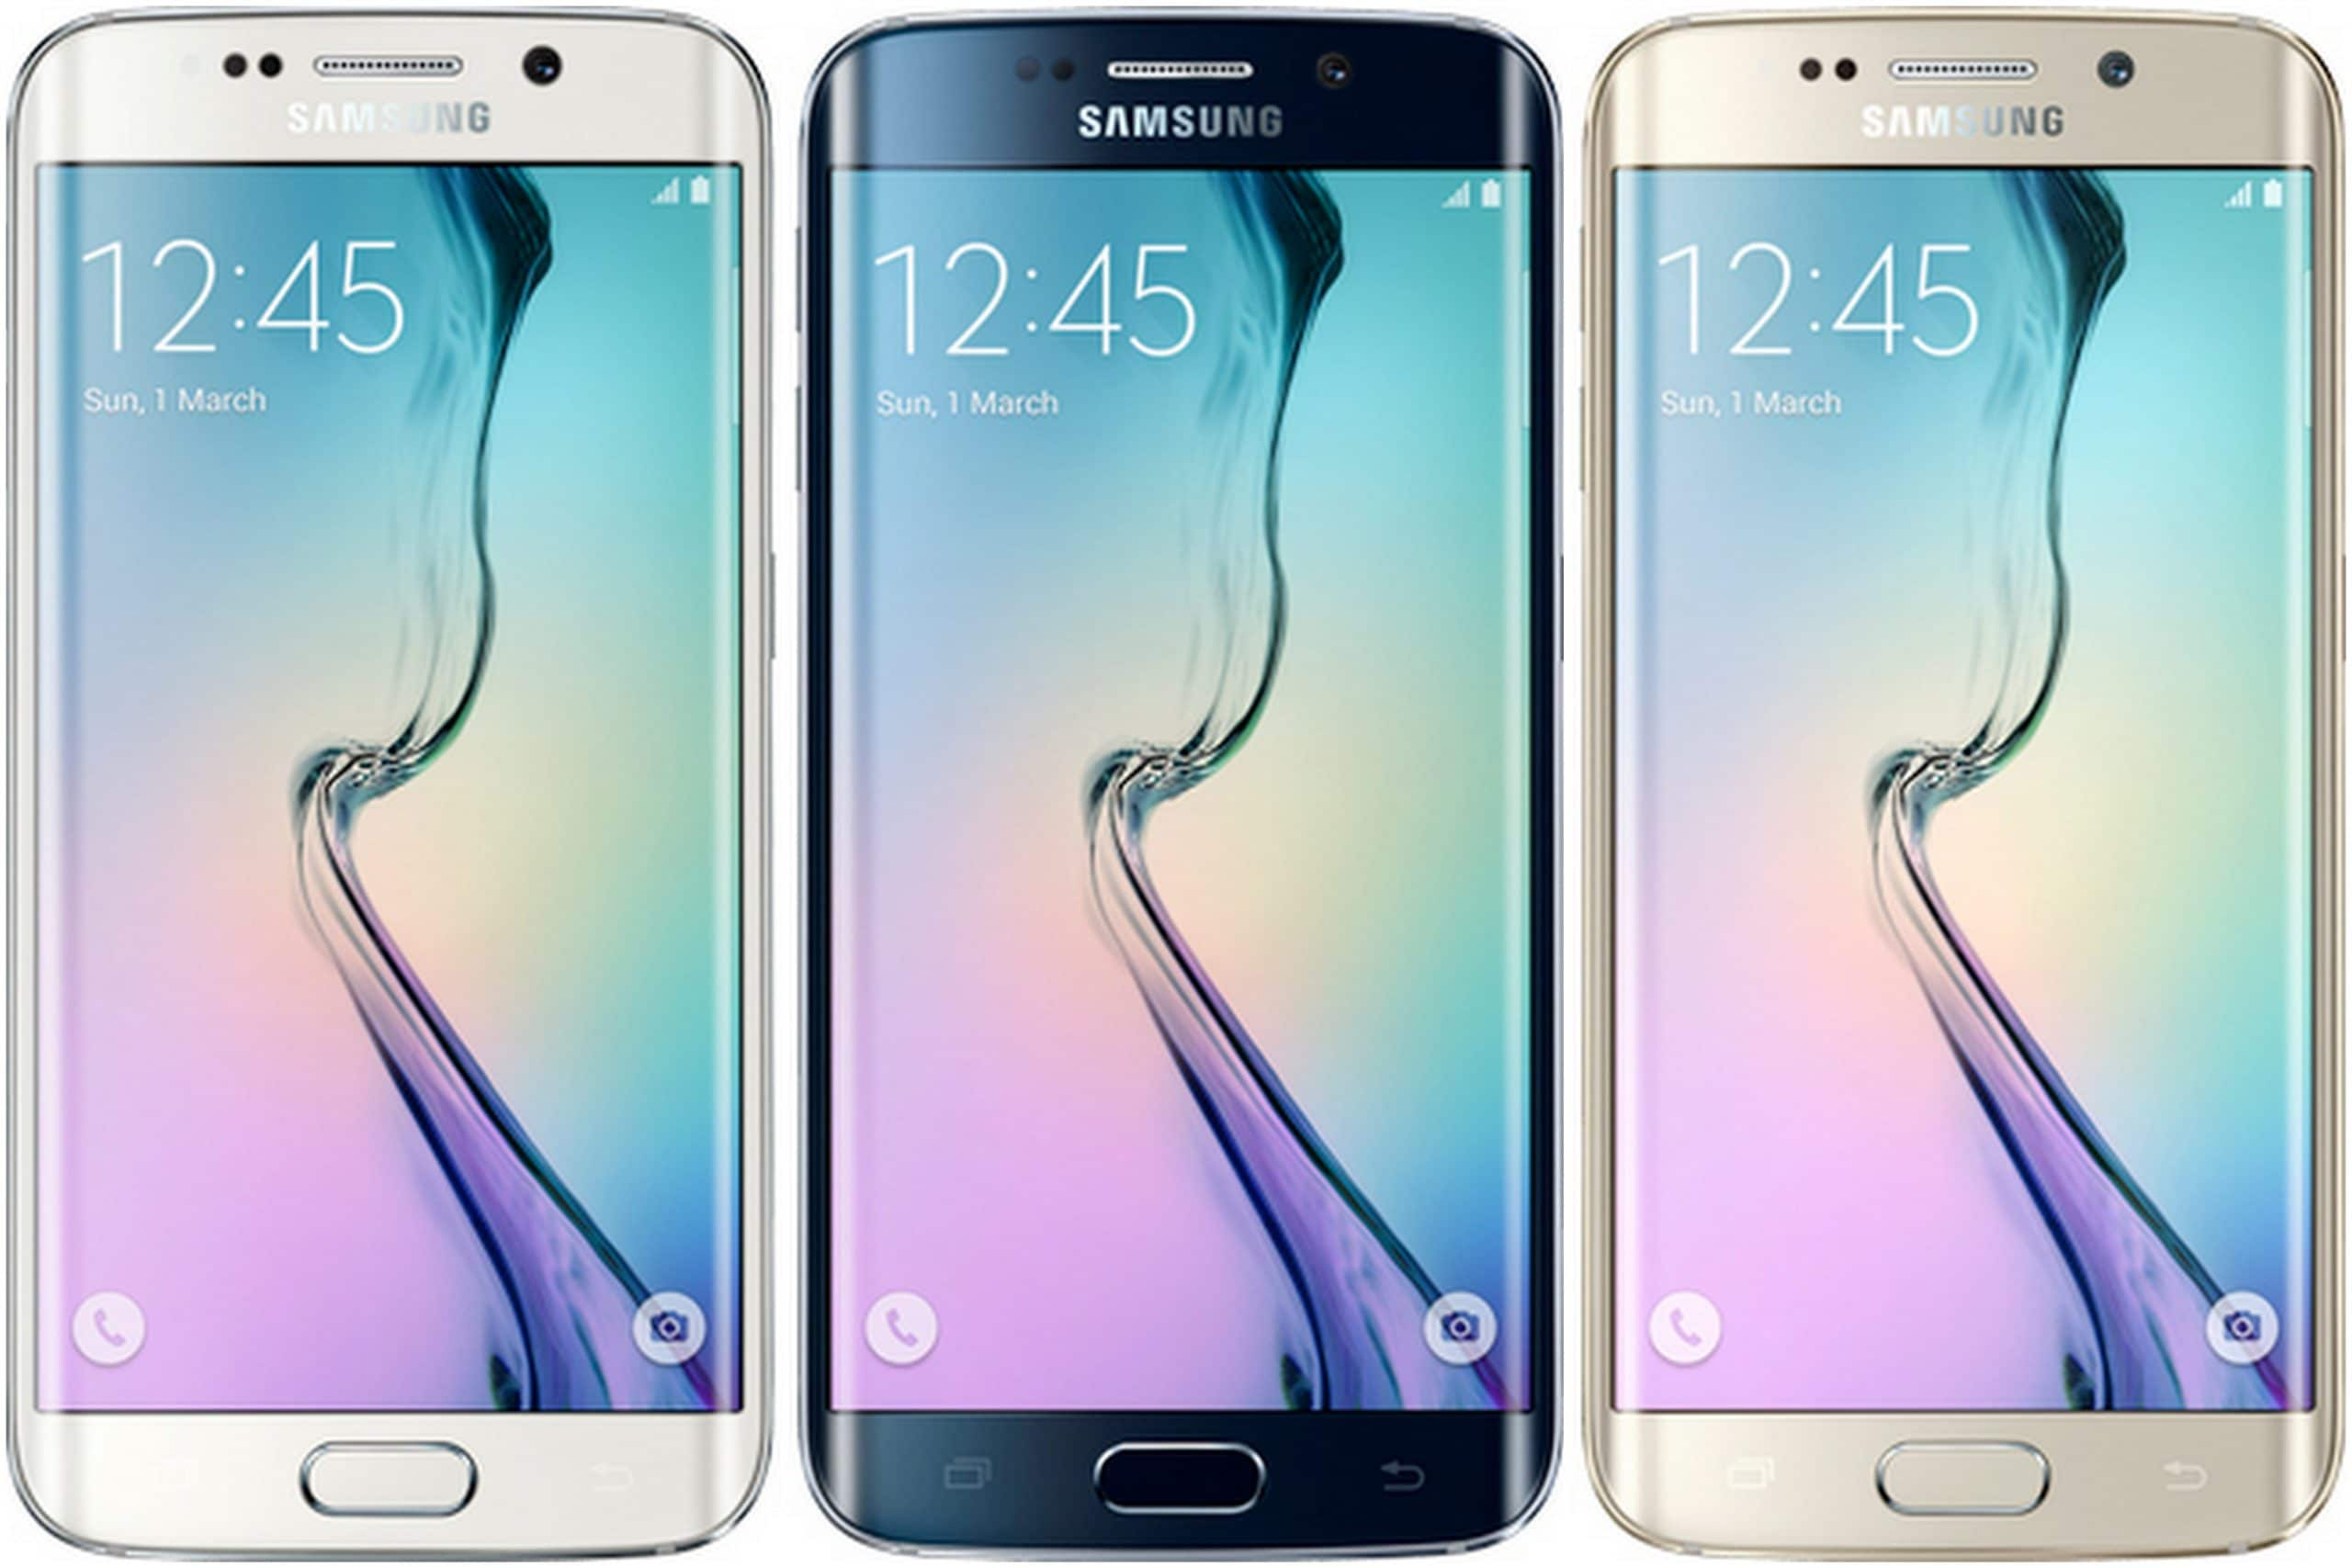 Samsung Galaxy S6 Edge smartphones